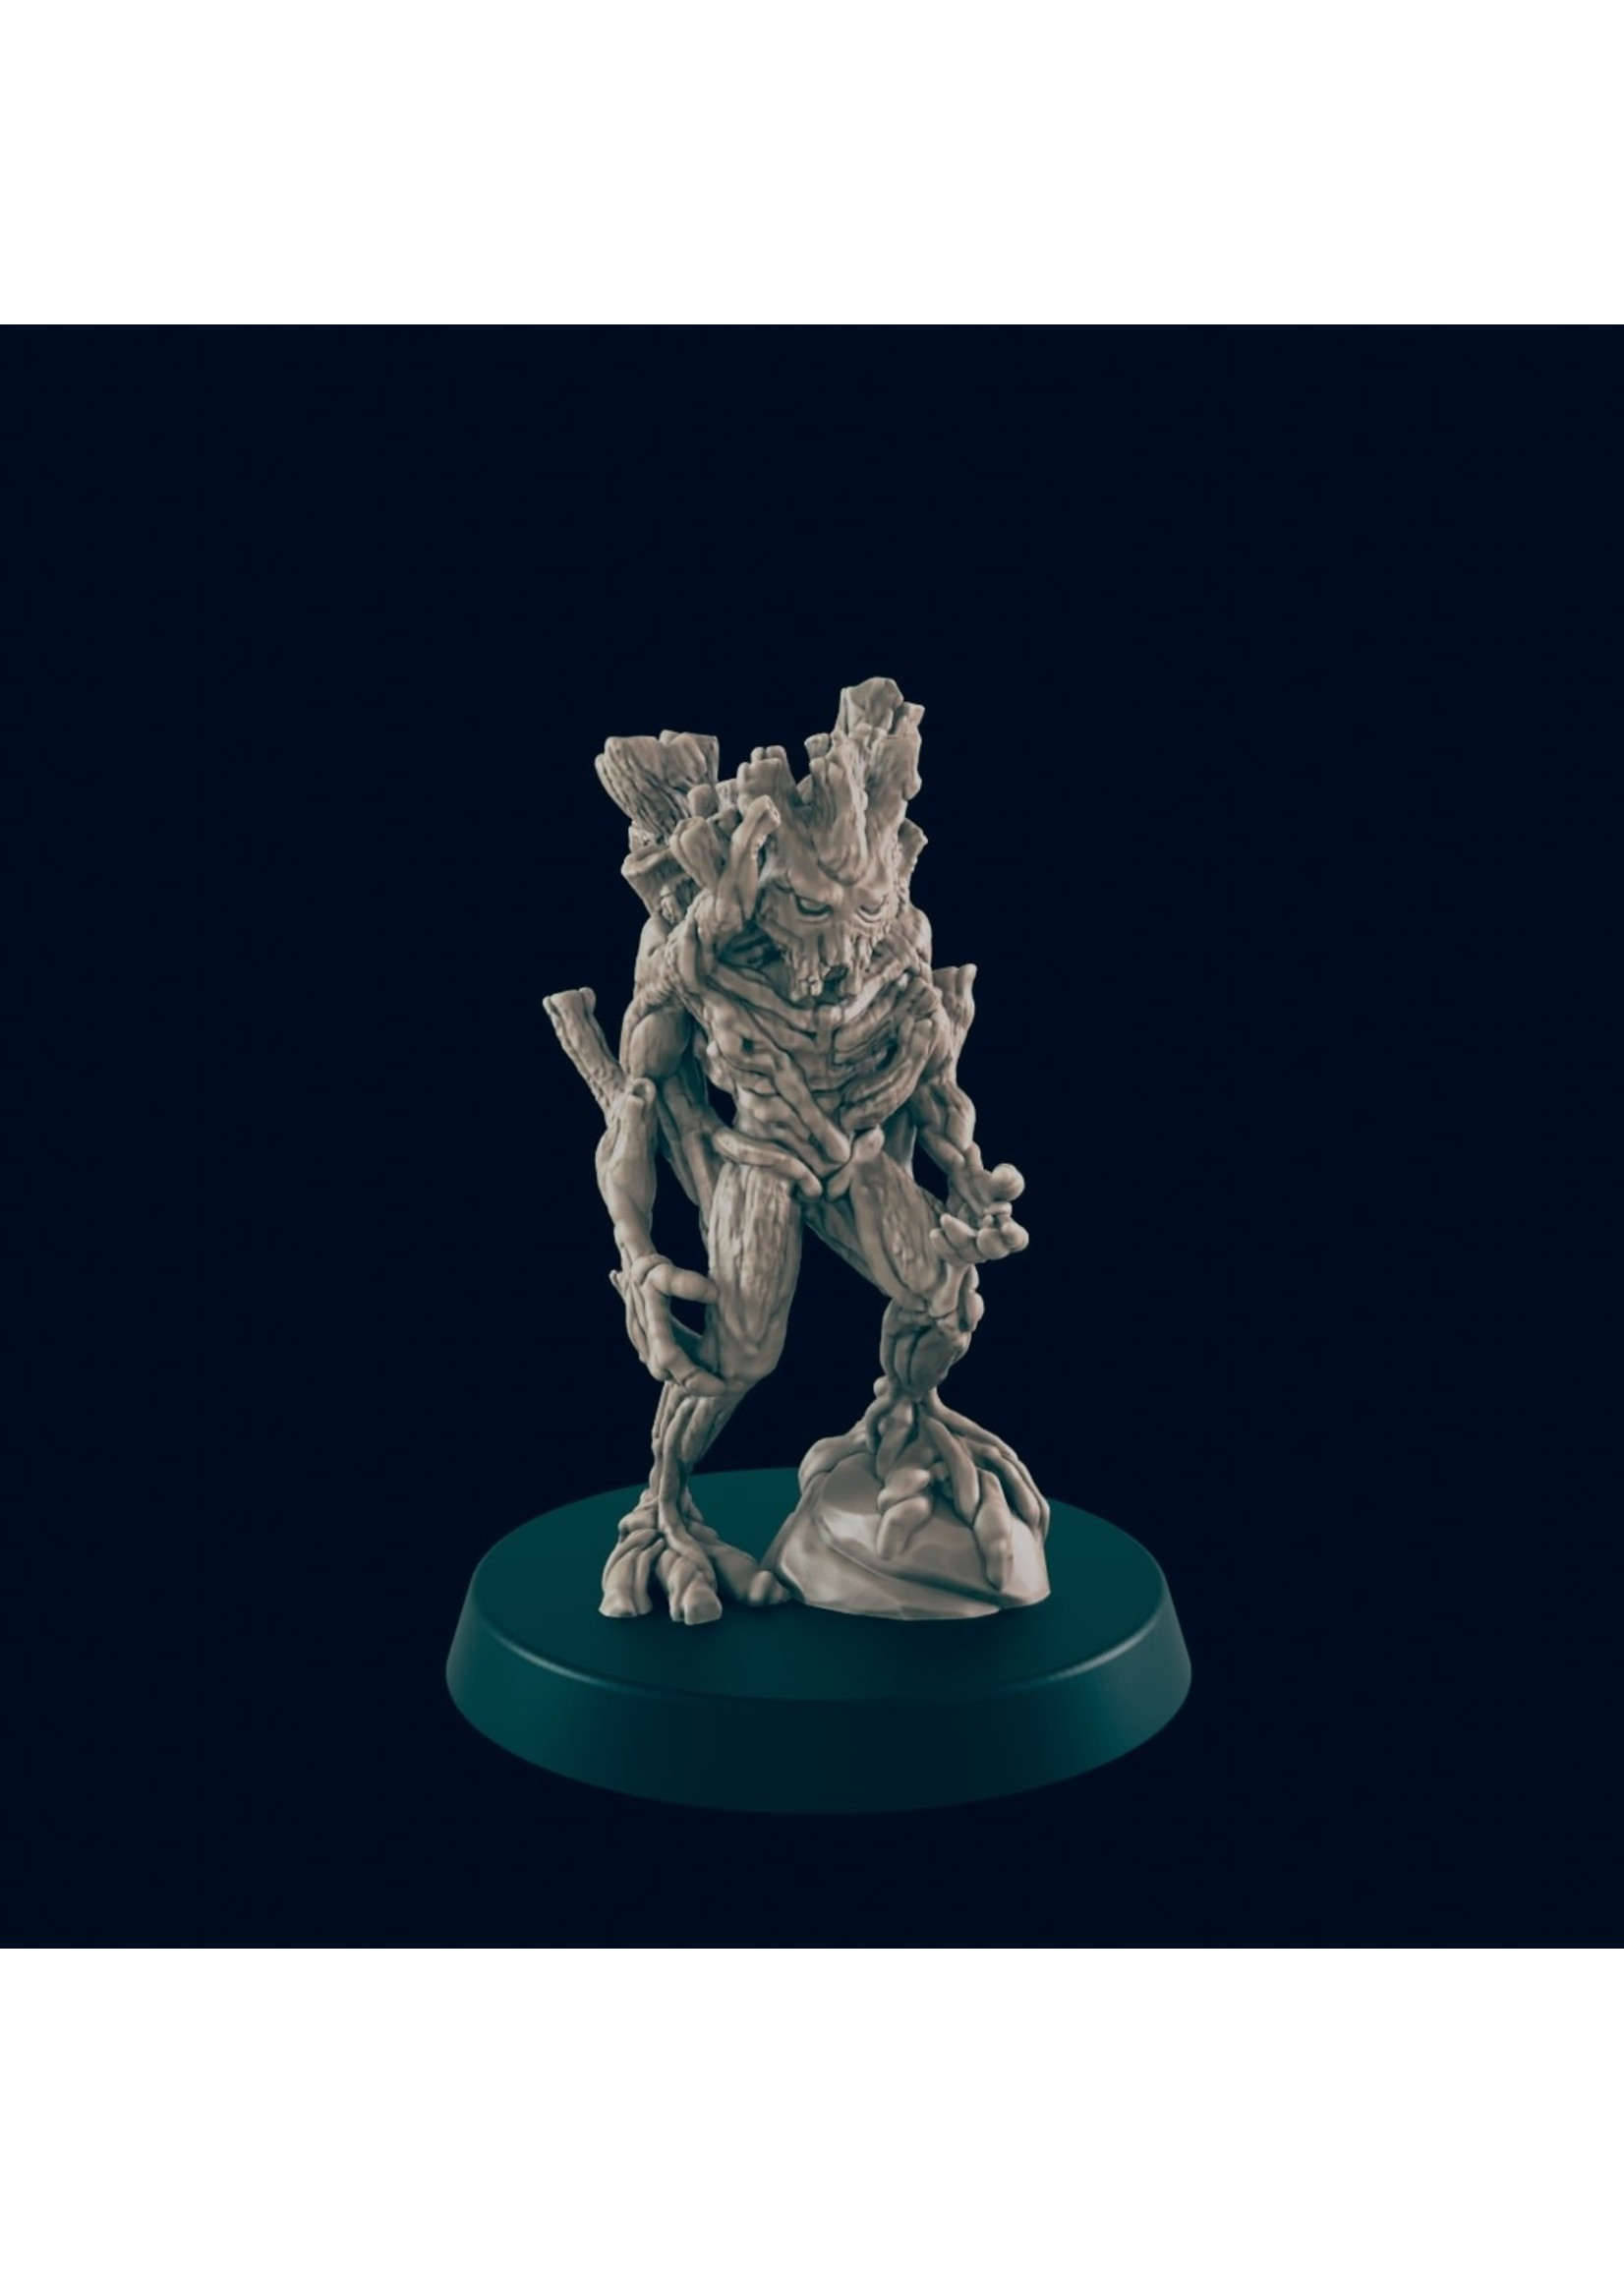 3D Printed Miniature - Twig Blight - Dungeons & Dragons - Beasts and Baddies KS